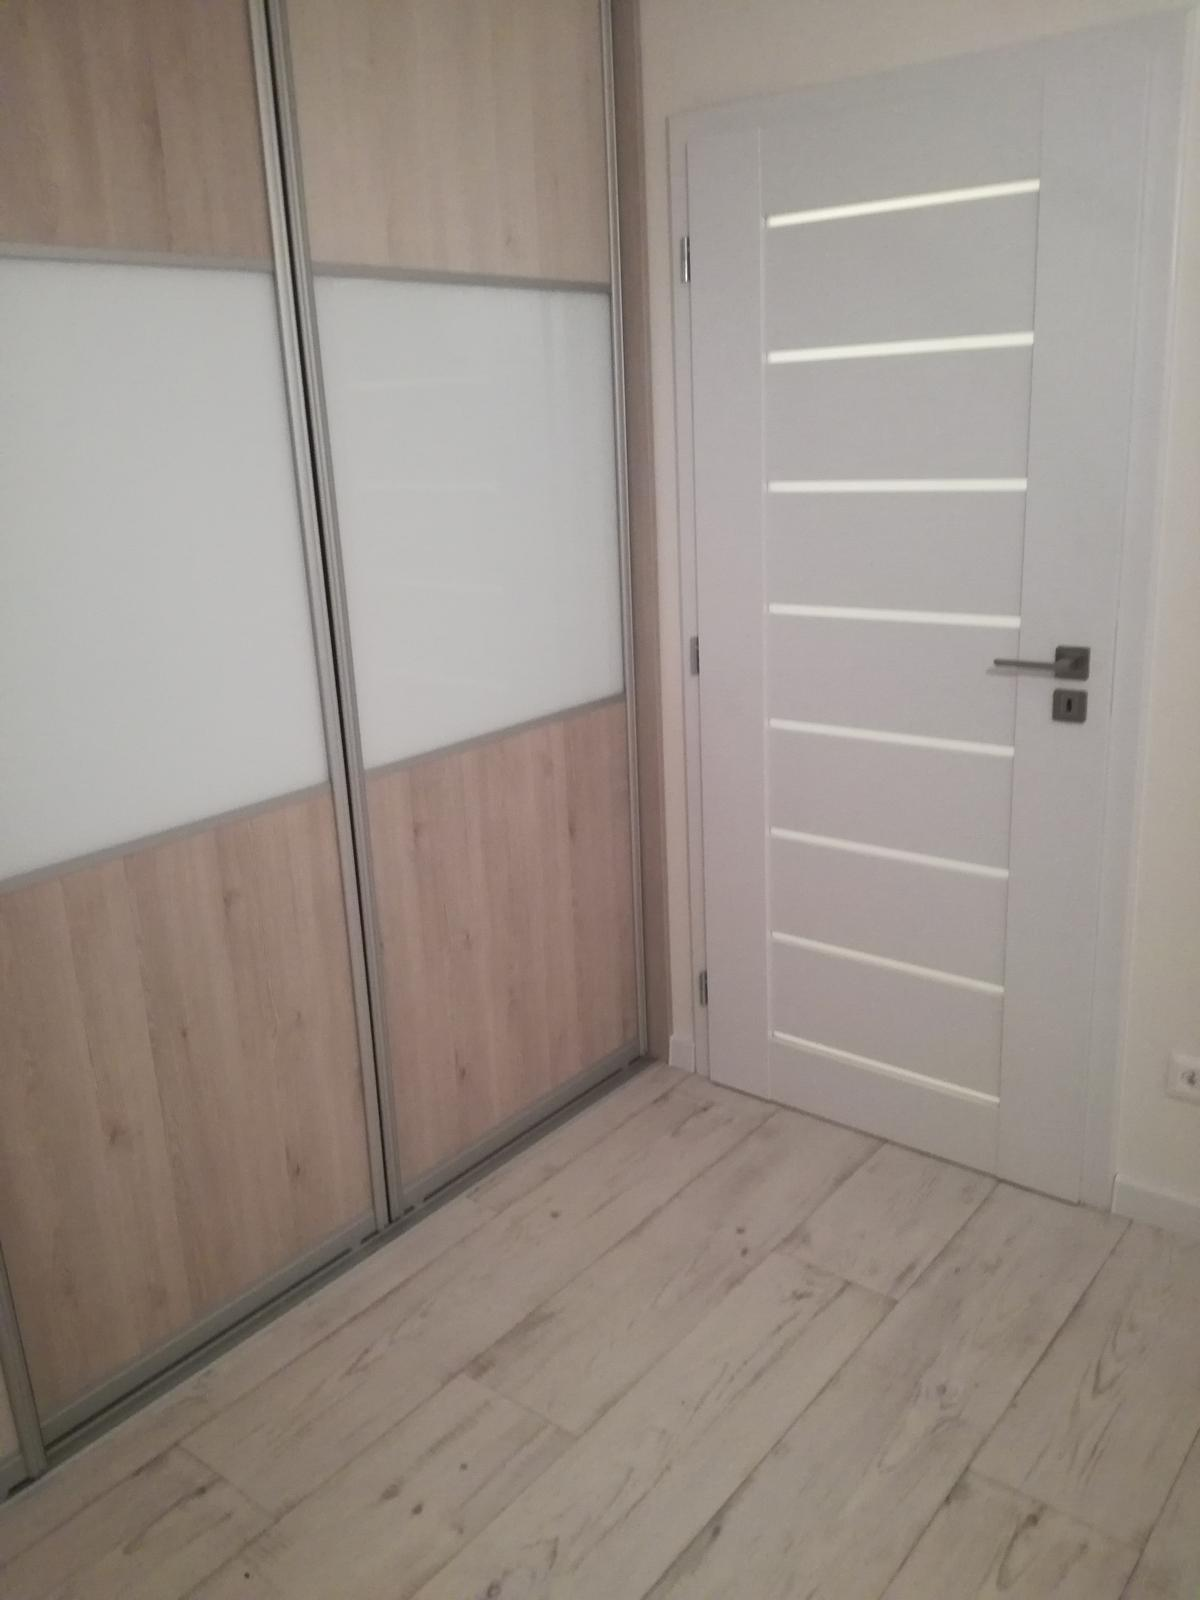 Vinylová podlaha Gerflor + rámové dvere Dre - Rámové dvere Dre Premium. Podlaha Greflor - Home Comfort 1536 Keywest Blanc.